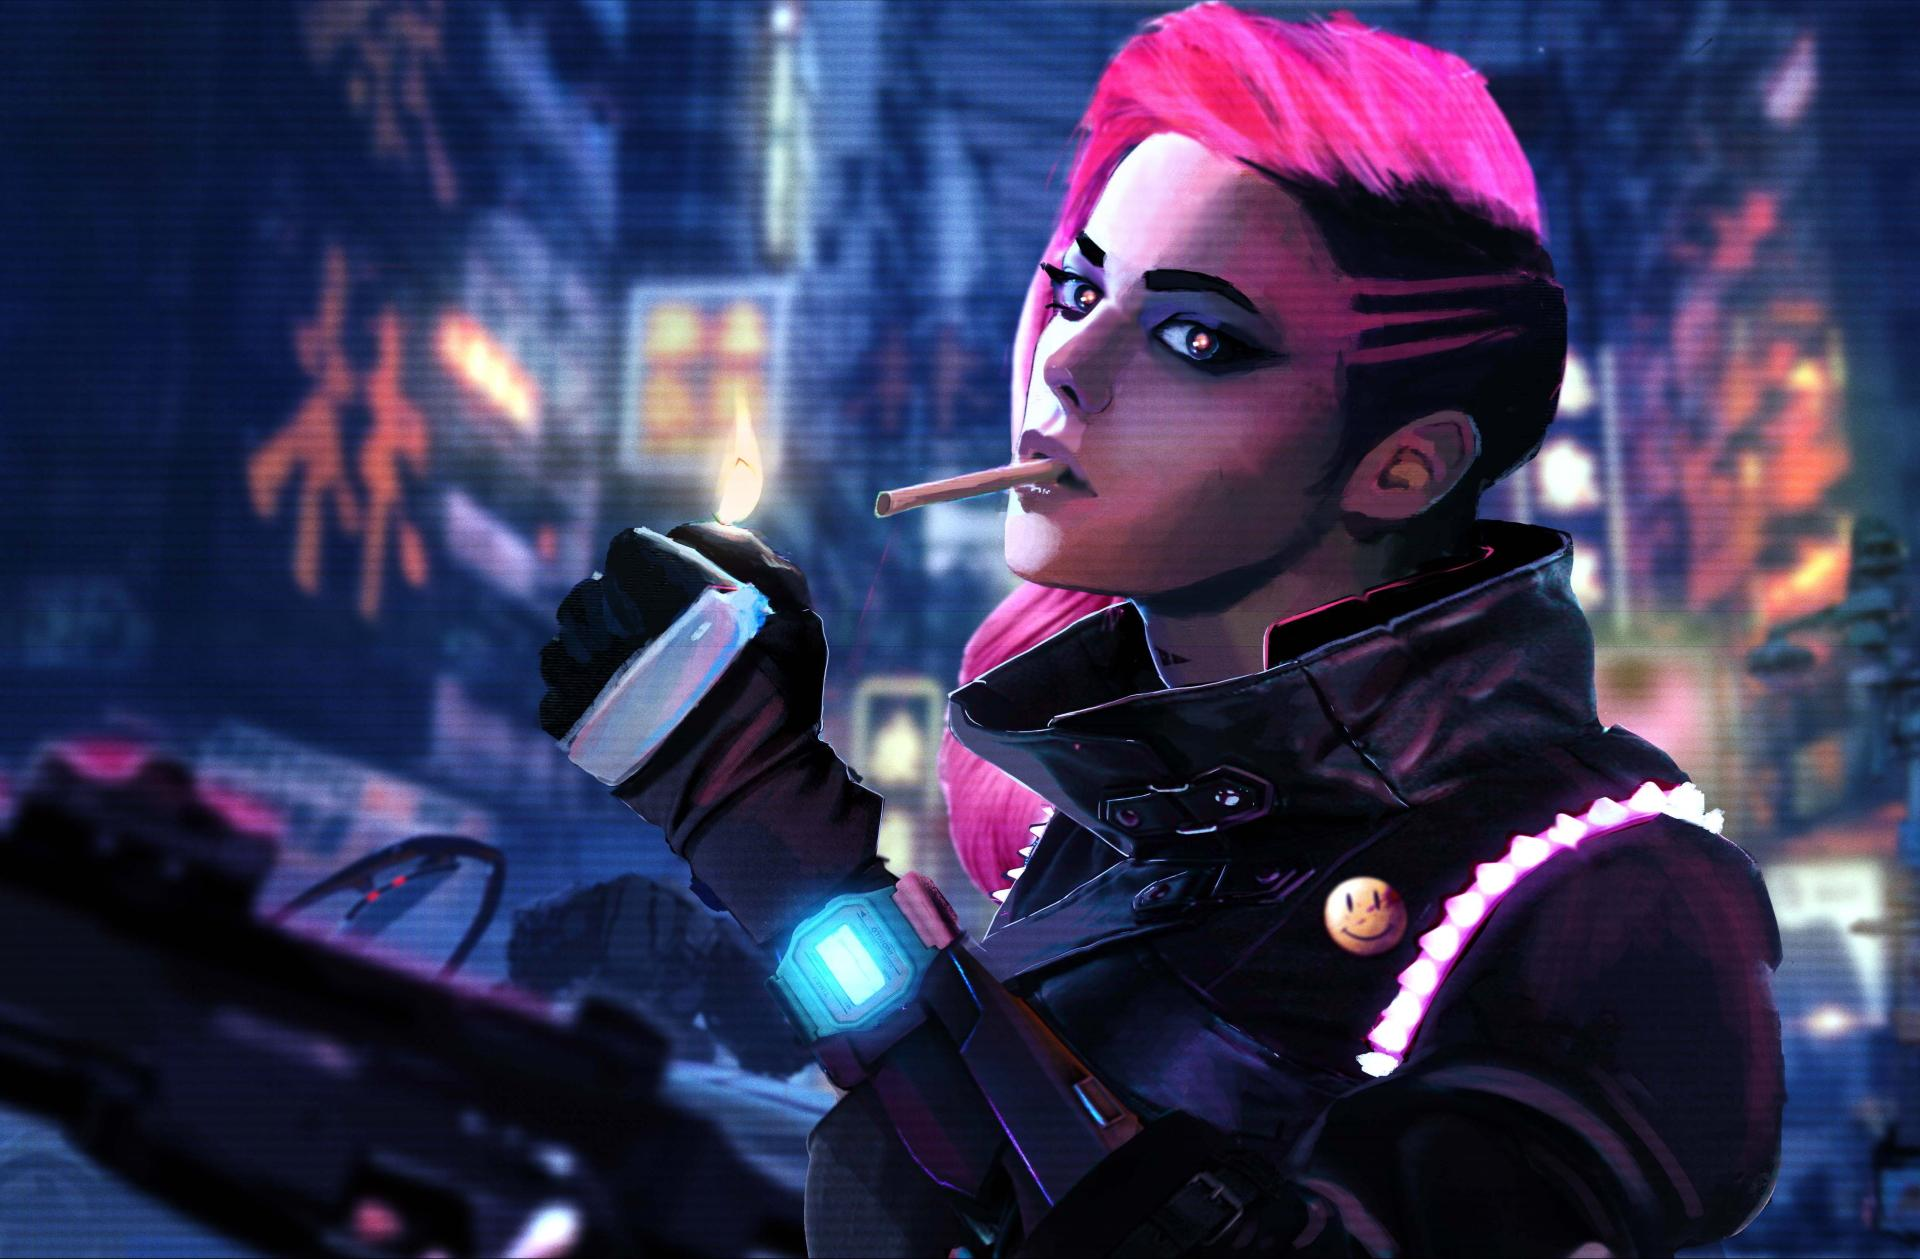 2048x2048 Sombra Overwatch Hd Ipad Air Hd 4k Wallpapers: Cyberpunk Sci Fi Wallpaper HD Download